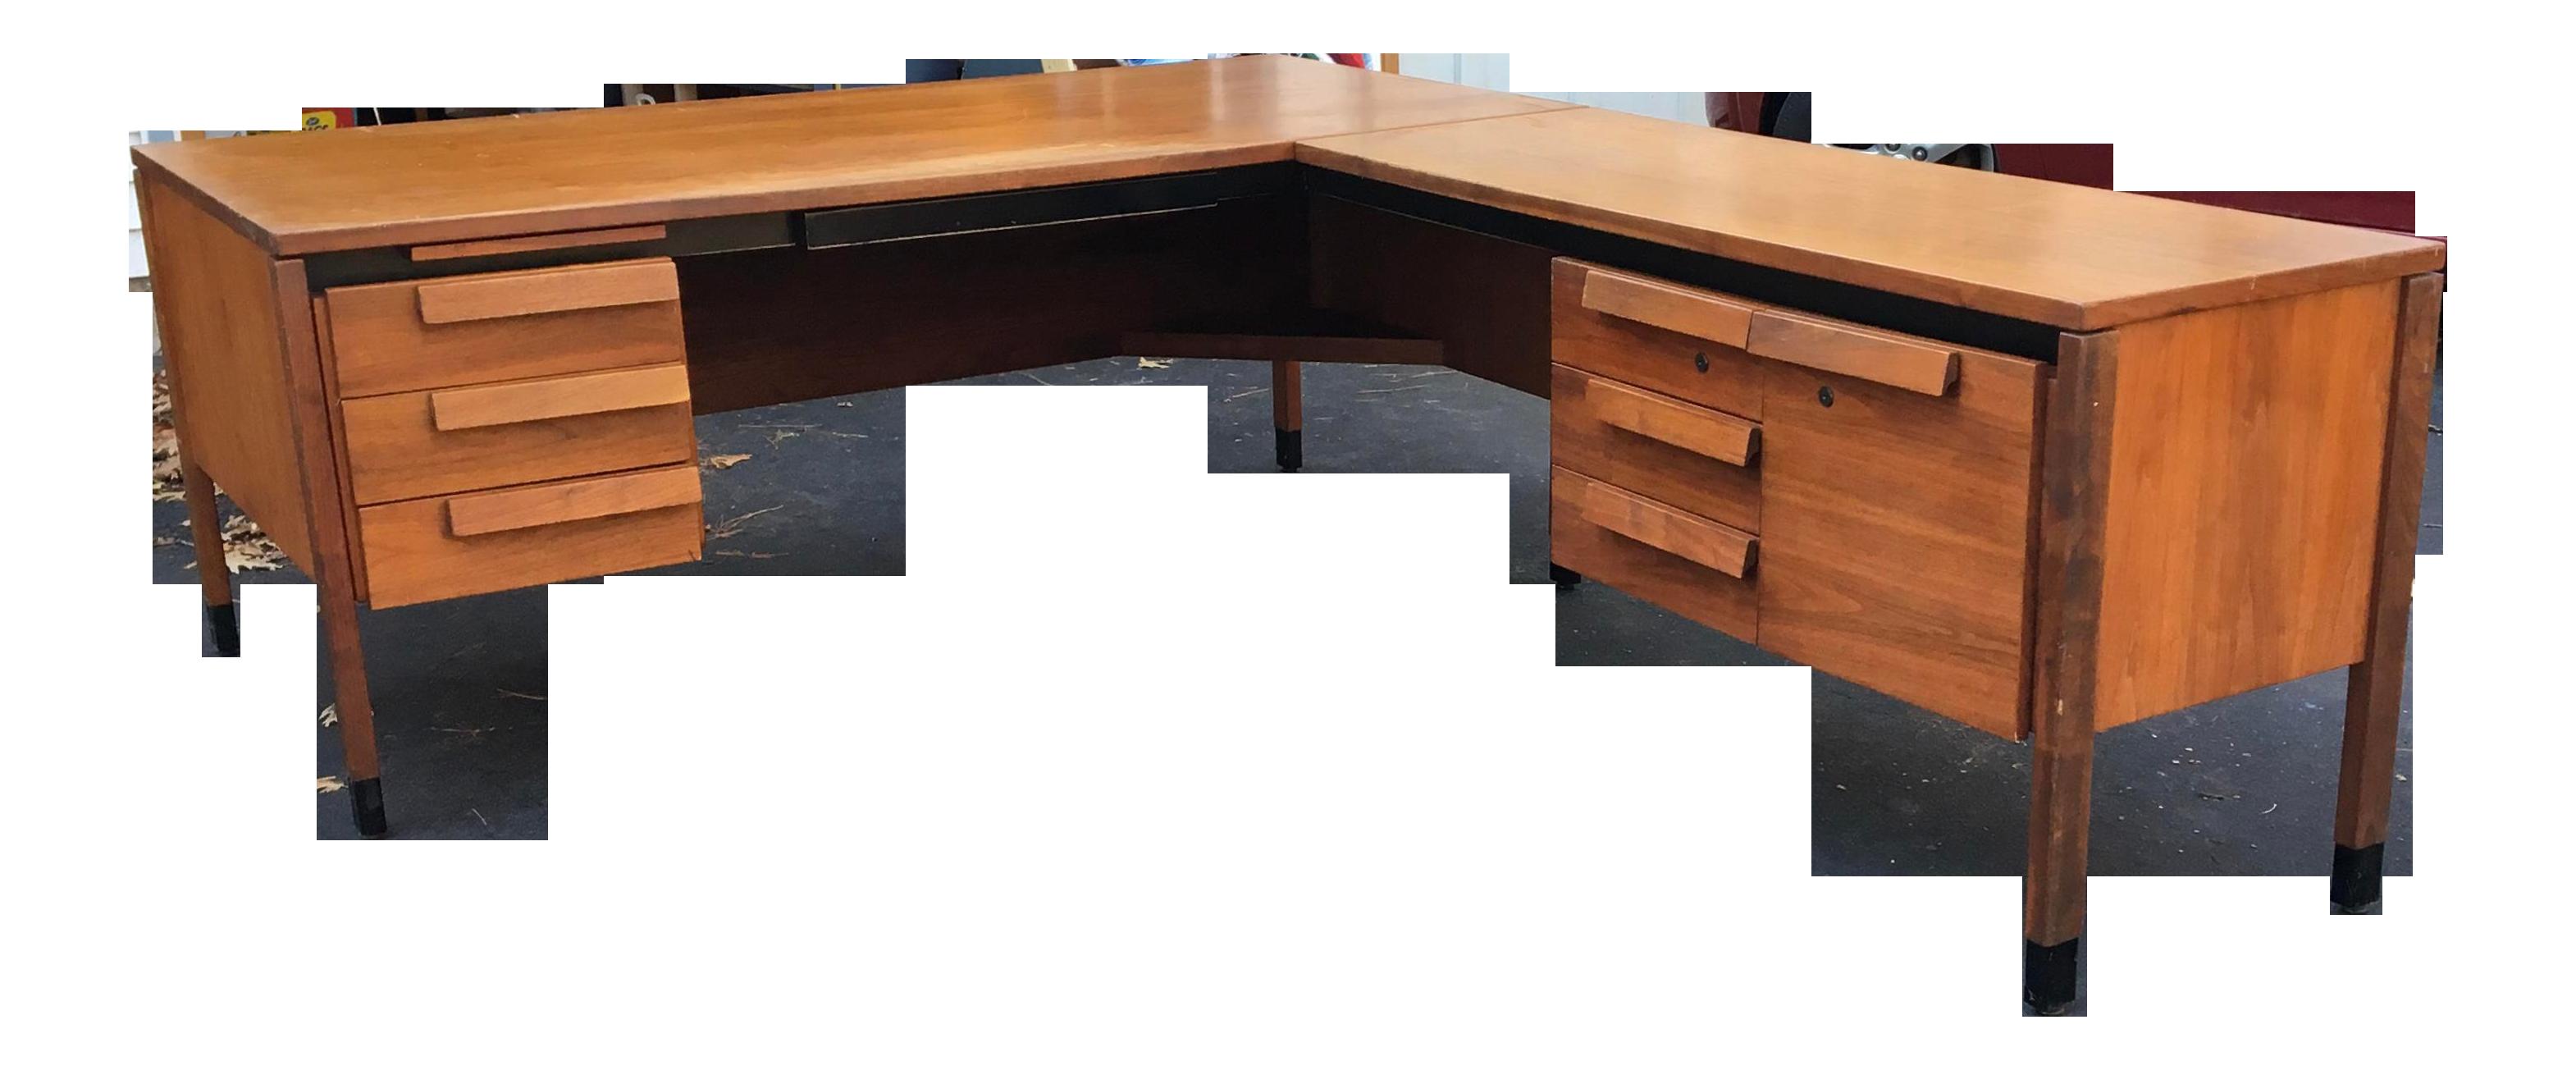 1960s Mid Century Modern Jens Rissom Style L Shaped Executive Desk Chairish